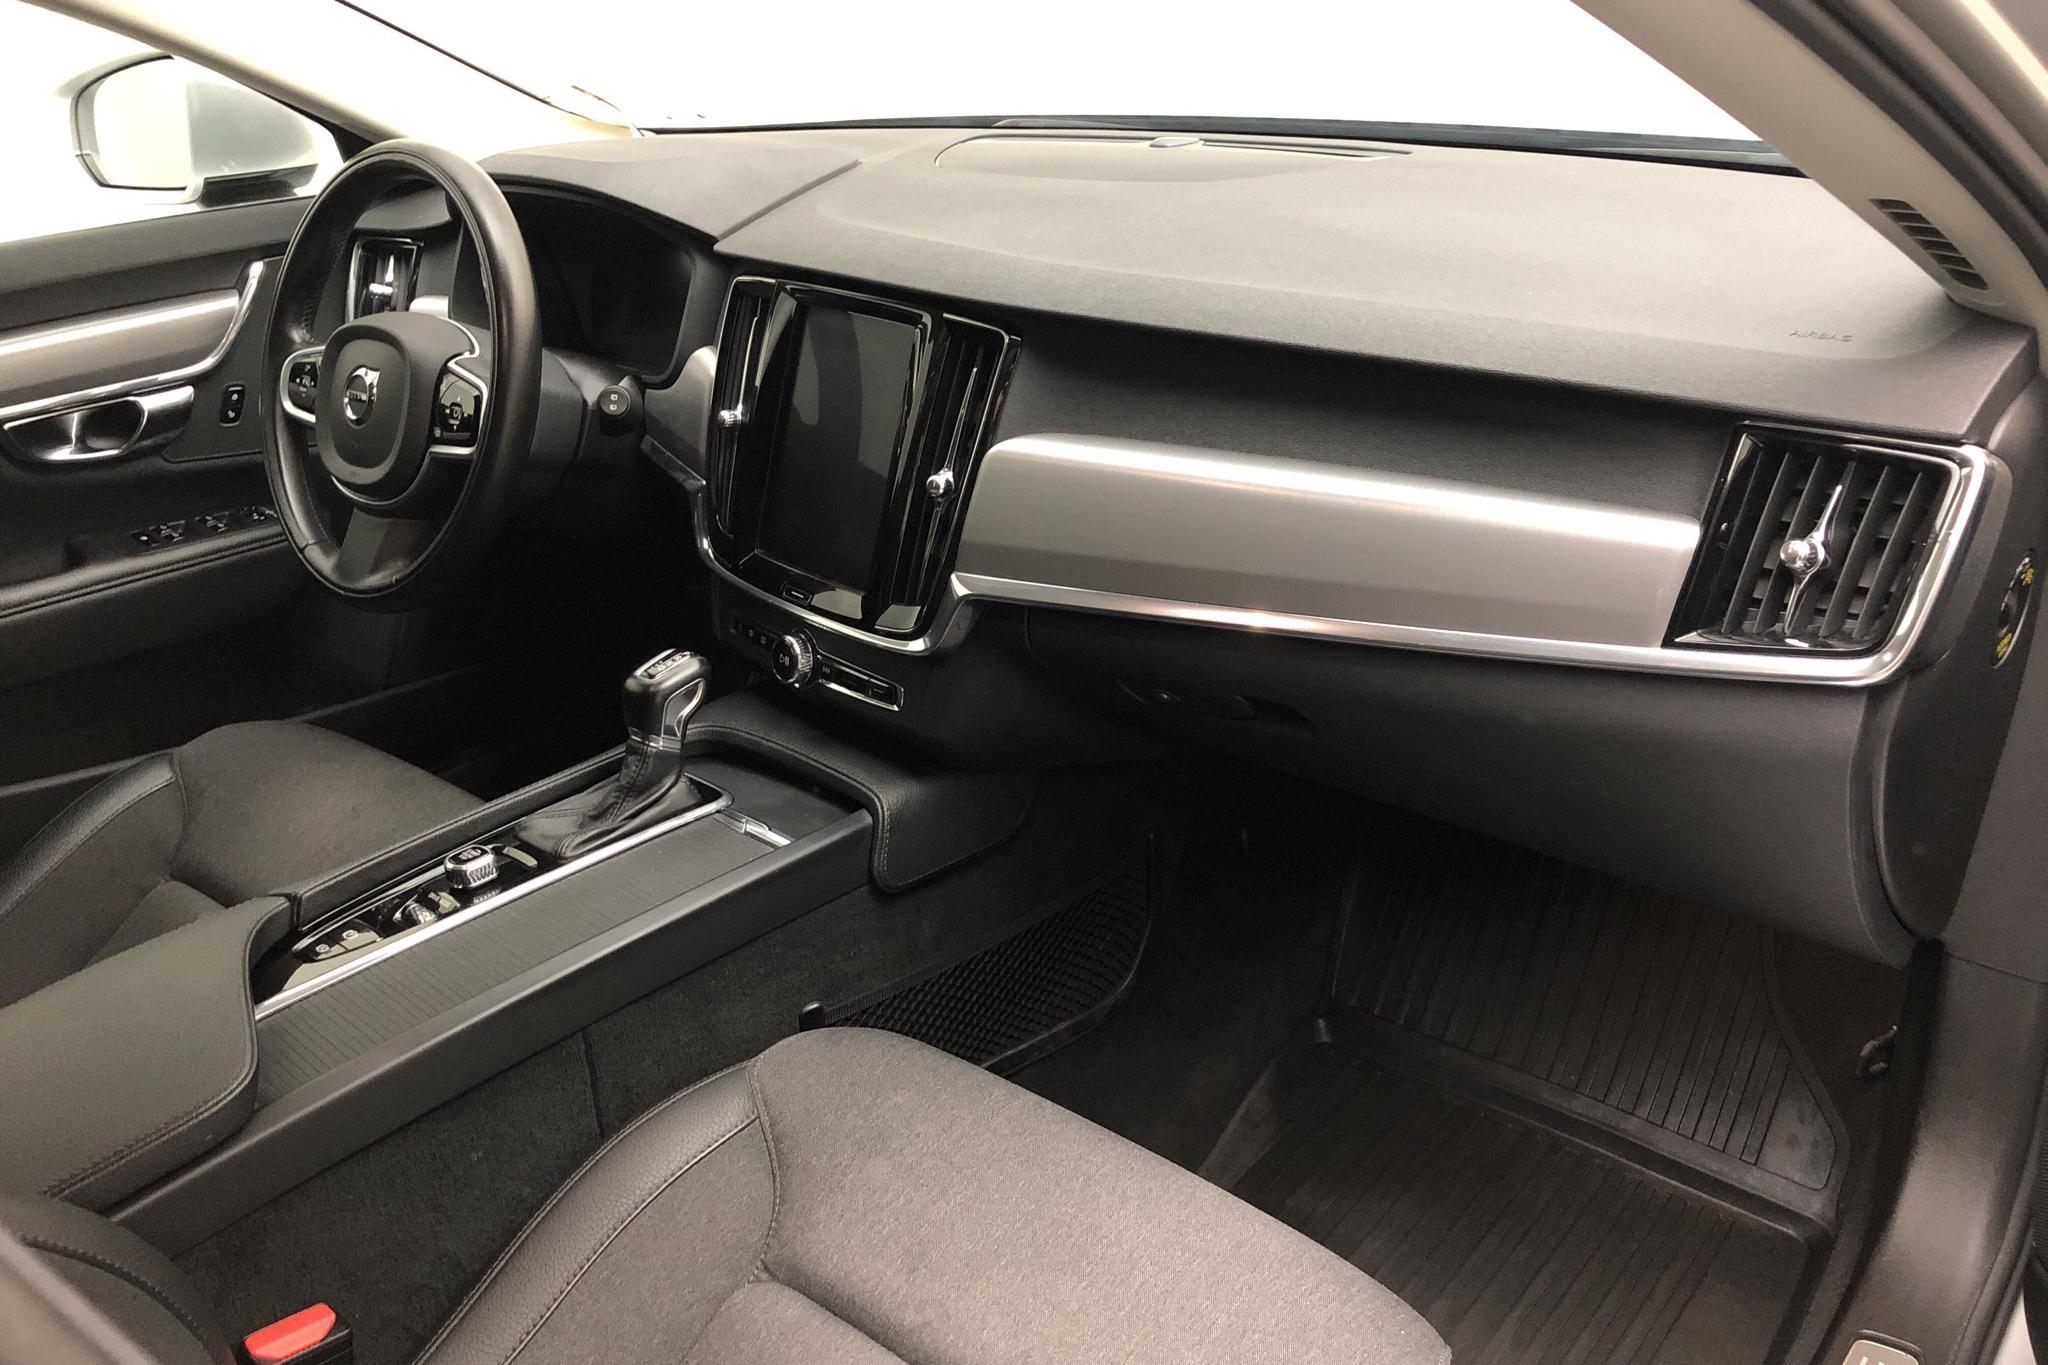 Volvo V90 D4 (190hk) - 142 300 km - Automatic - silver - 2018